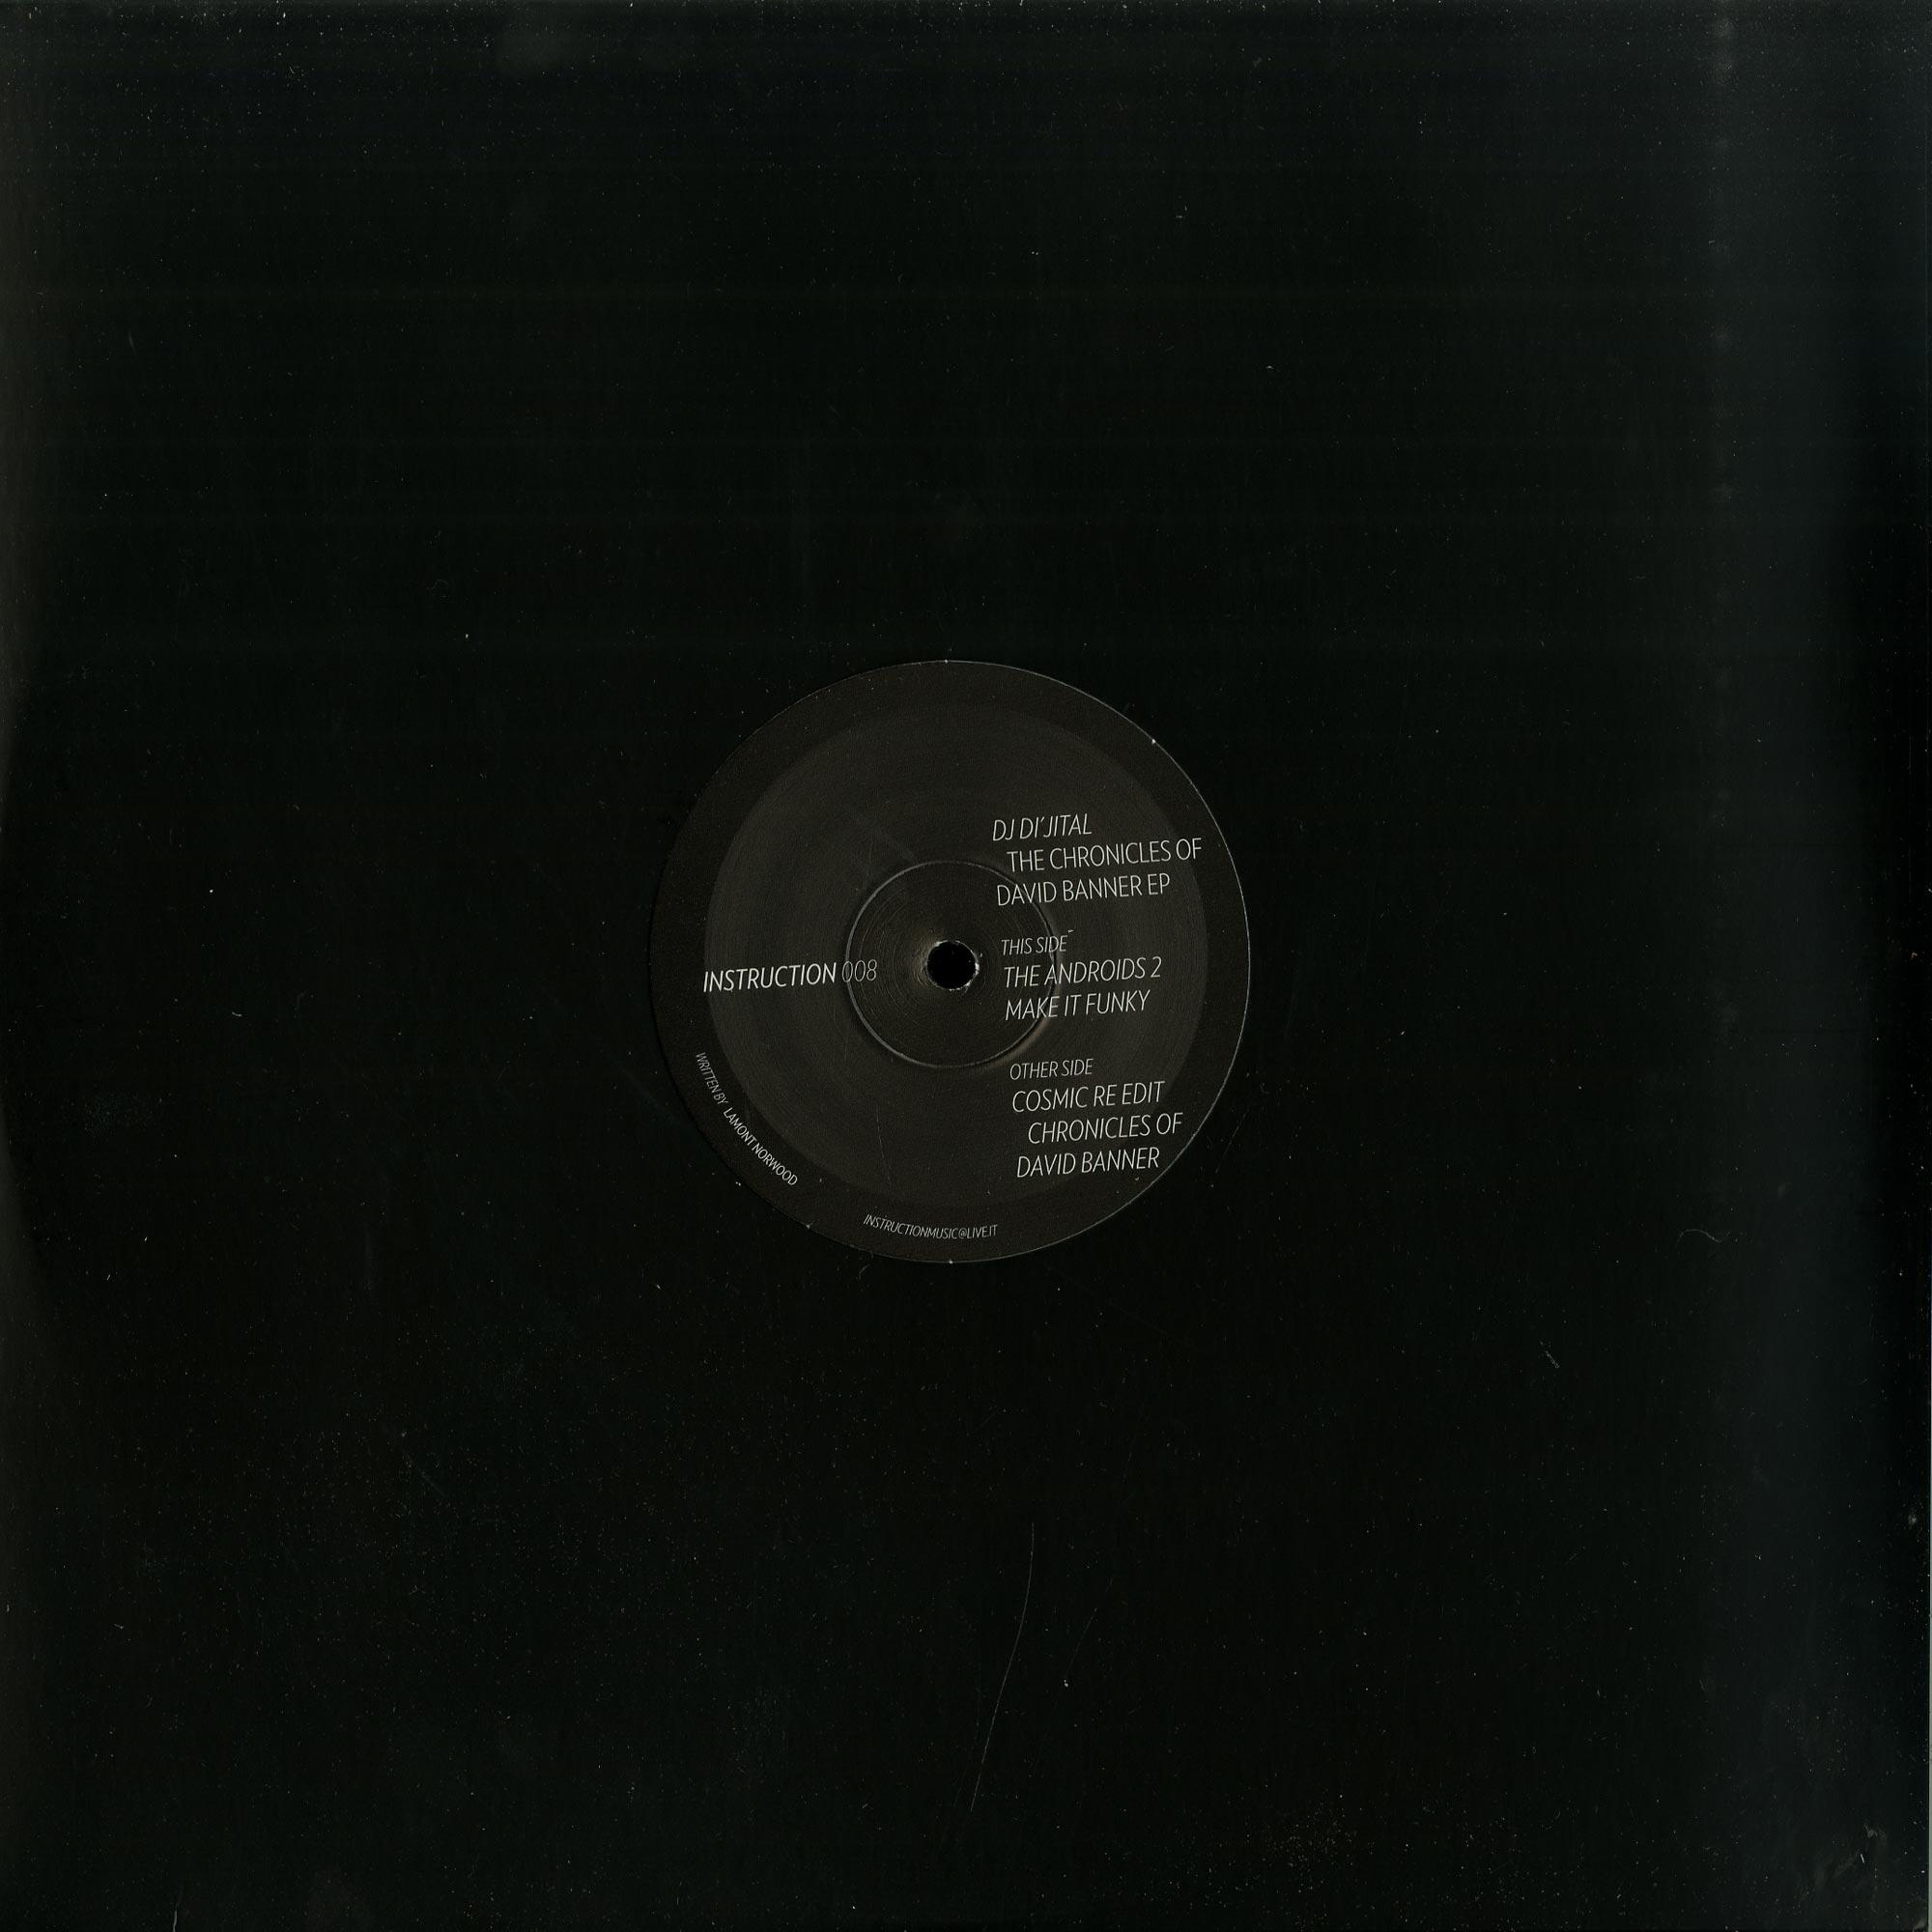 DJ Dijital - THE CHRONICLES OF DAVID BANNER EP